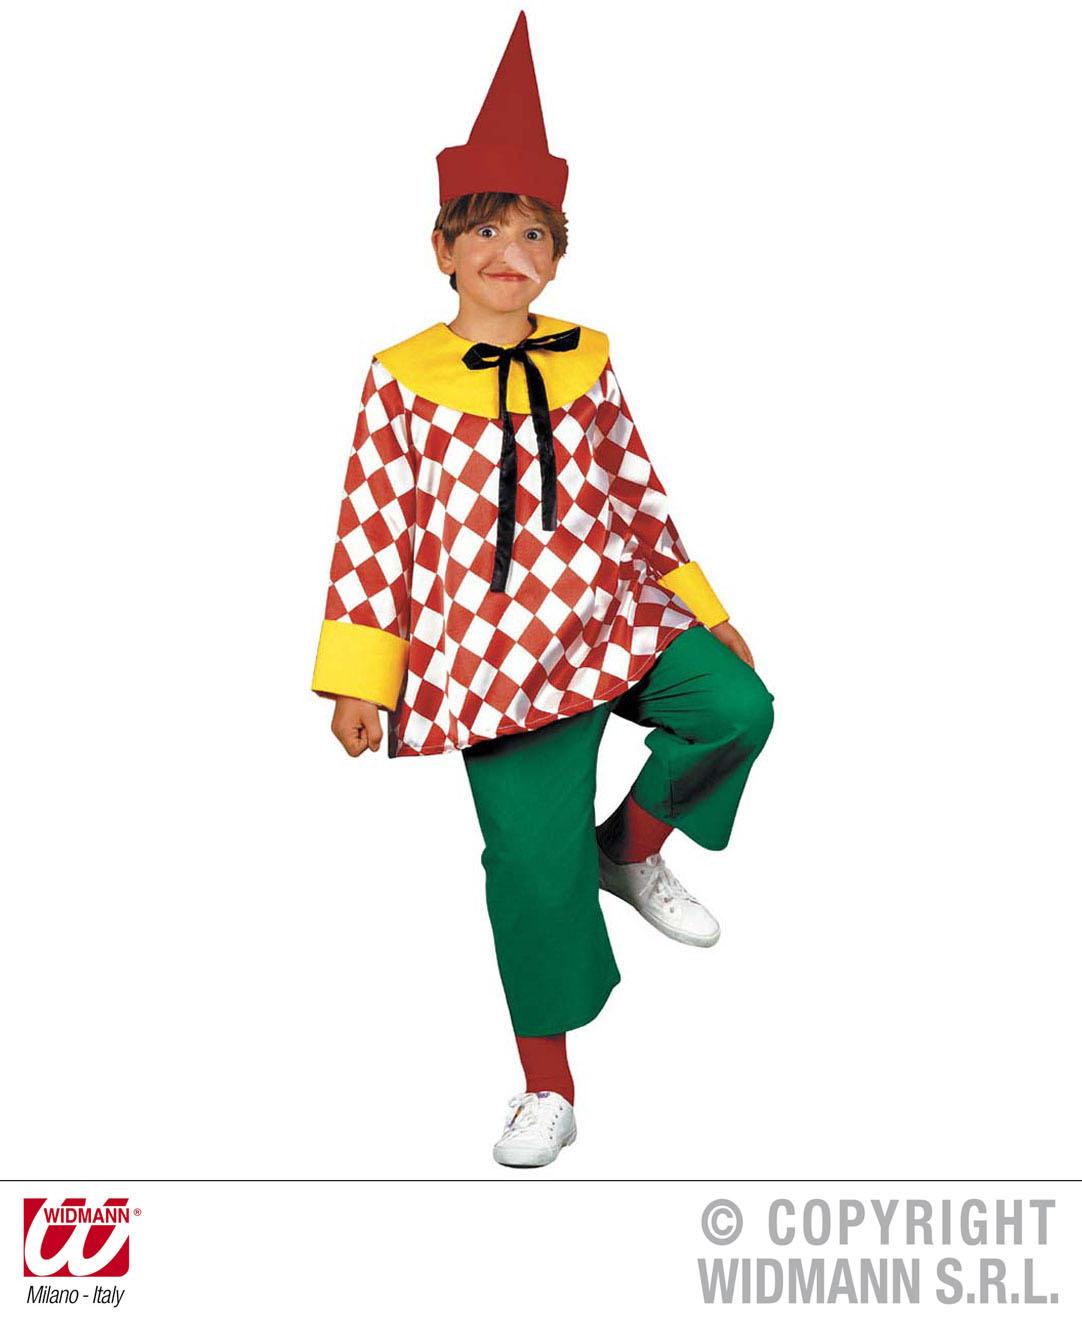 kinder marionette junge kleidung kost m pinocchio clown outfit kleidung 140cm ebay. Black Bedroom Furniture Sets. Home Design Ideas